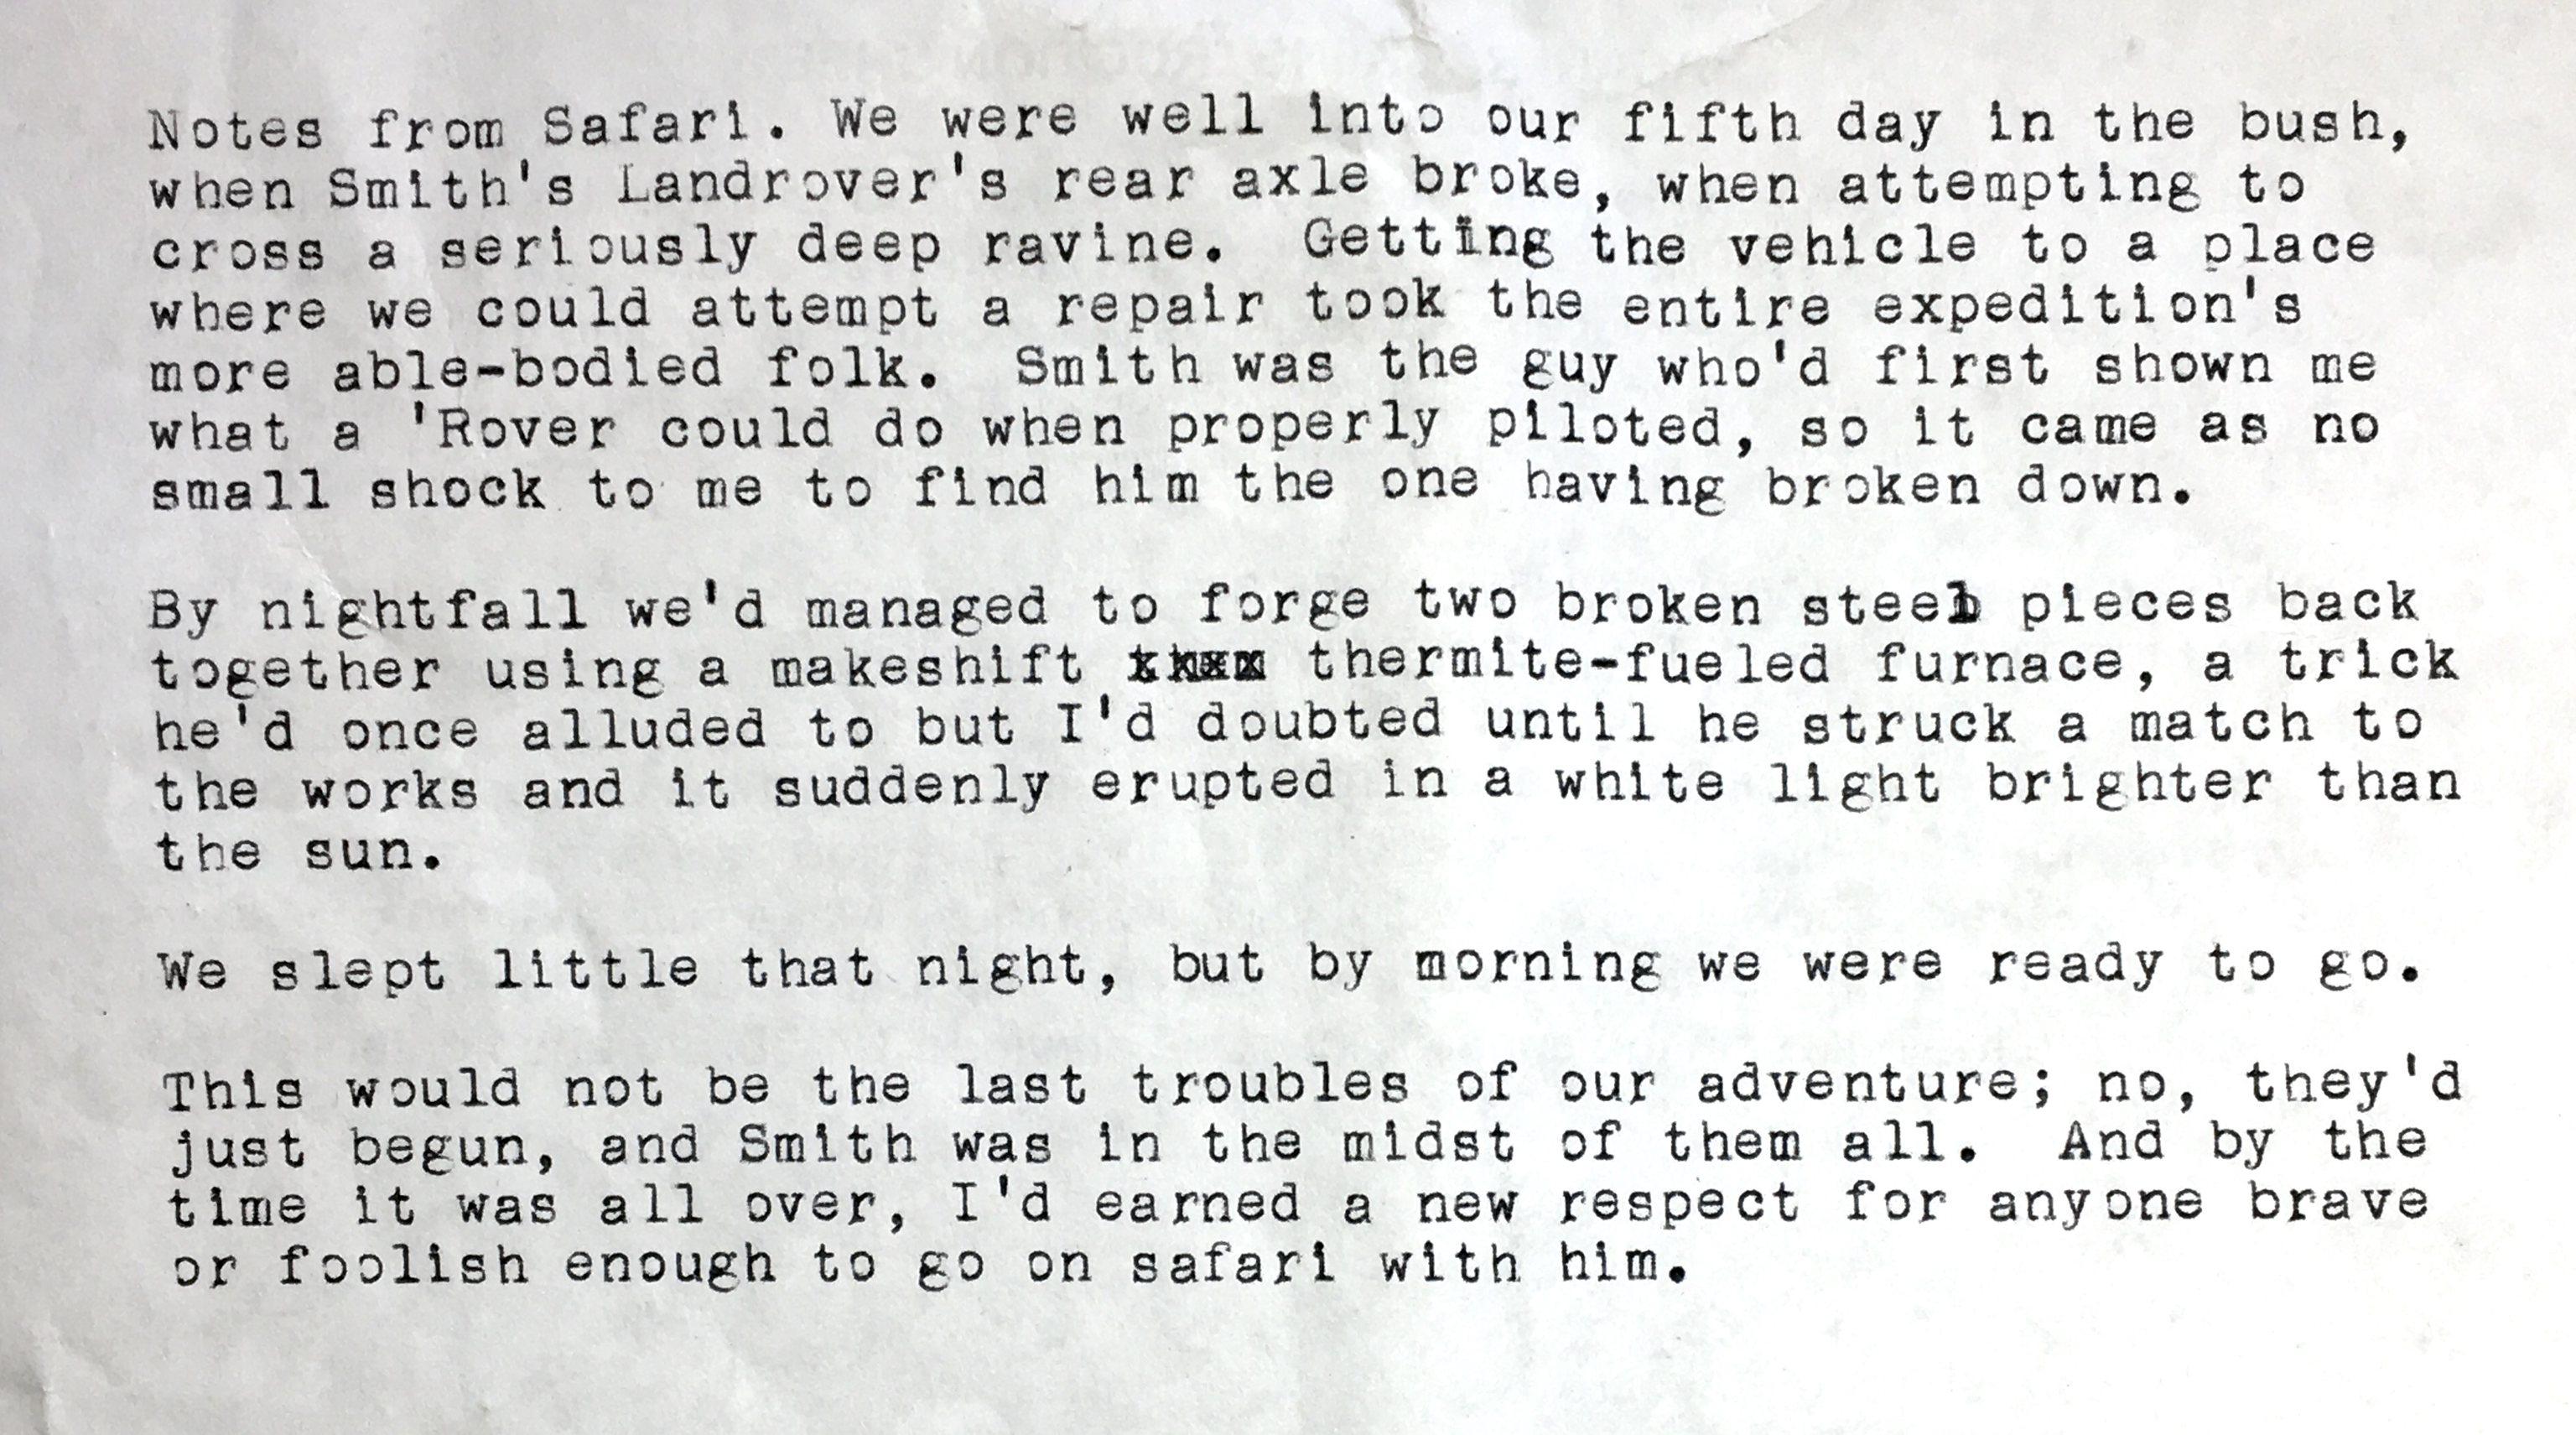 Notes From Safari